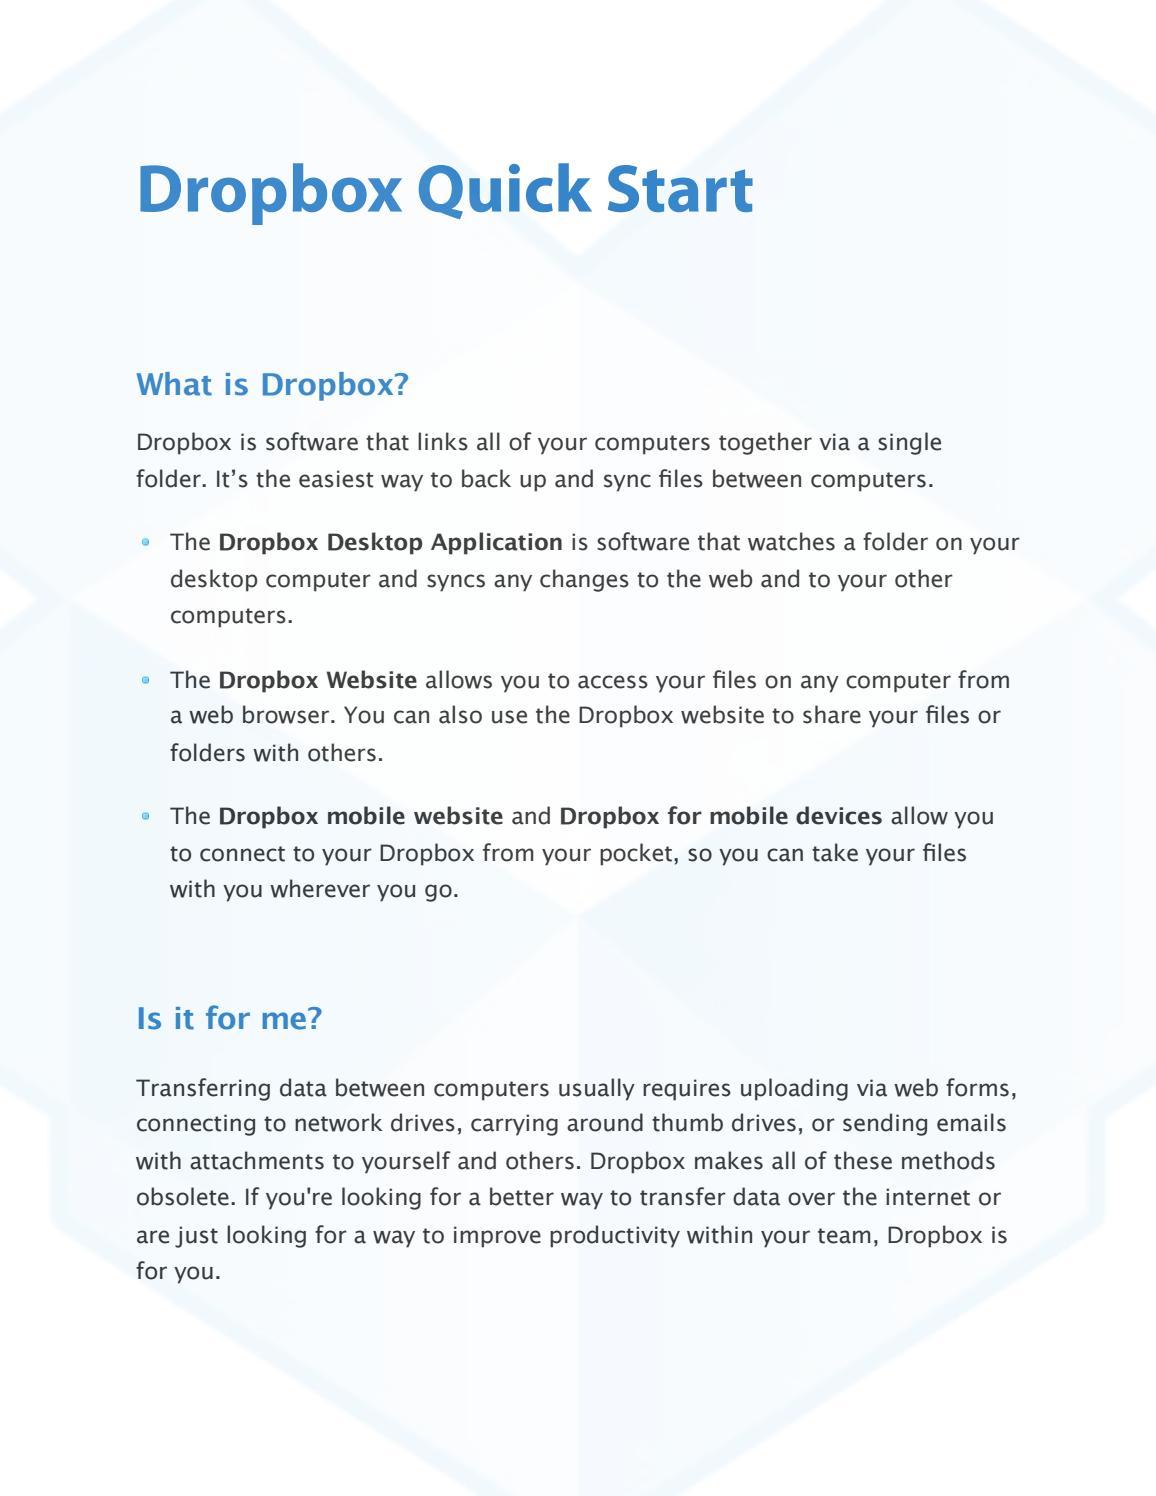 DROPBOX QUICK START by